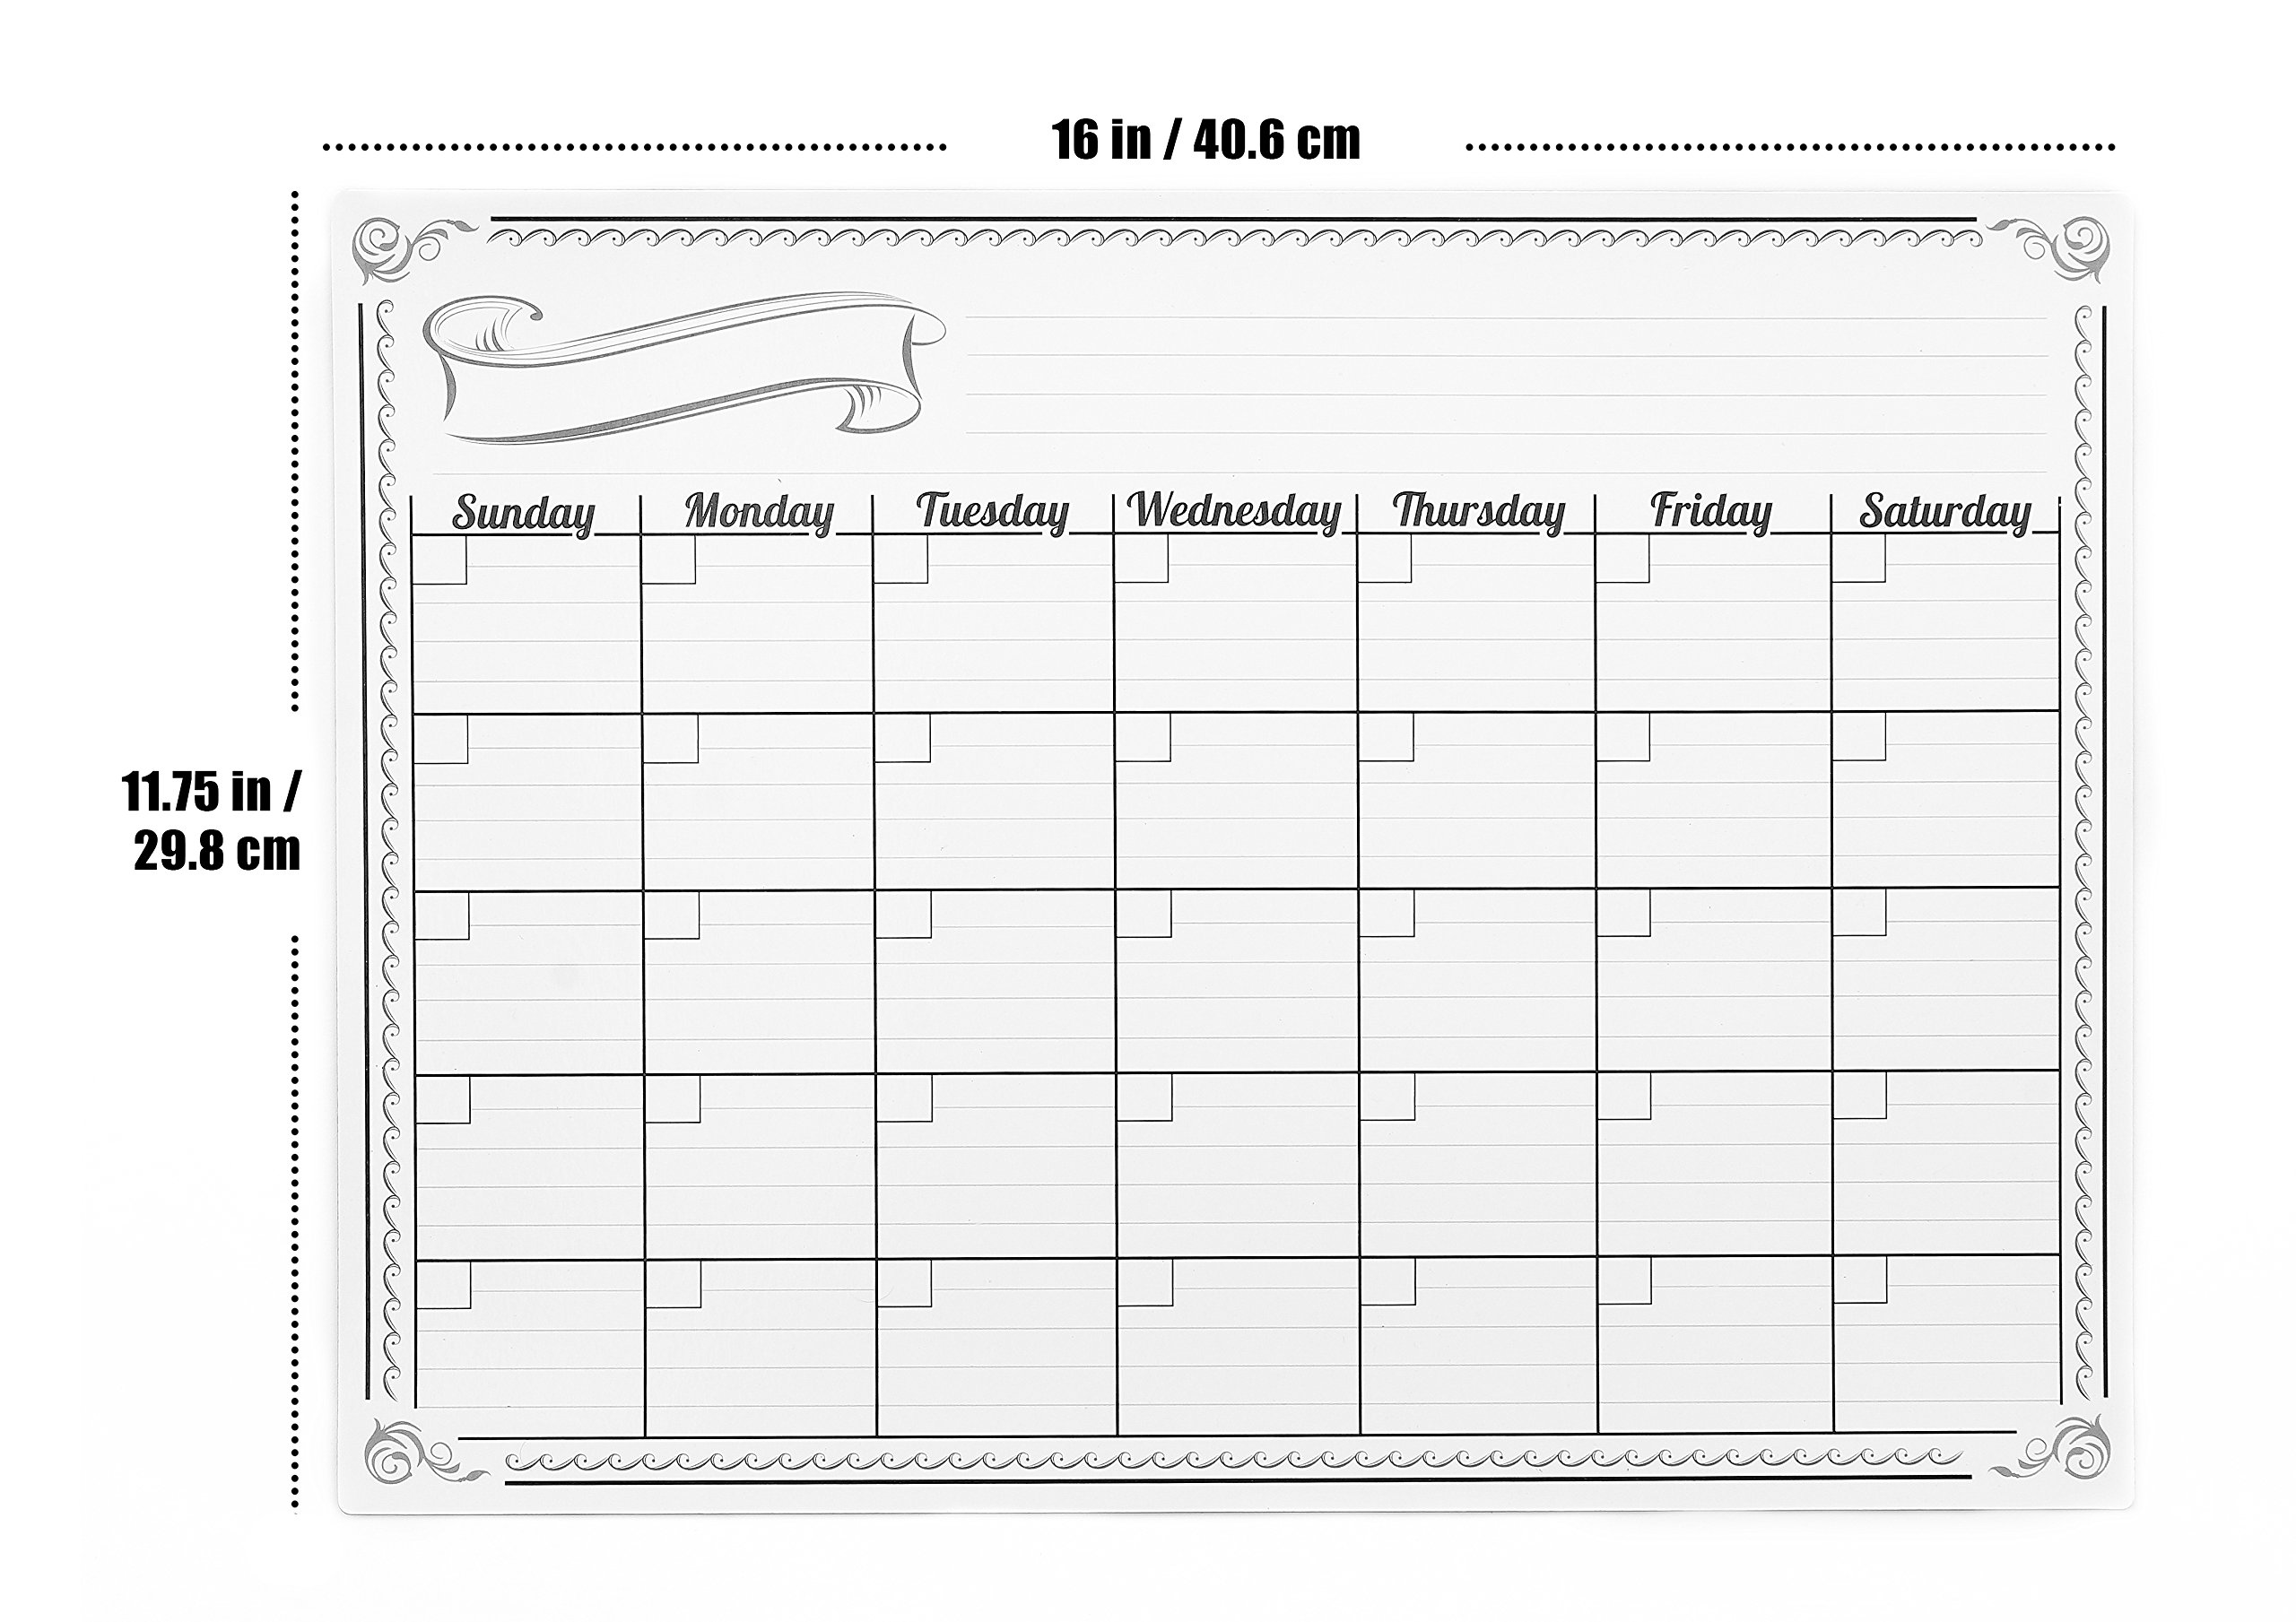 Magnetic Monthly Calendar For Refrigerator : Buy refrigerator magnetic calendar monthly dry erase whiteboard